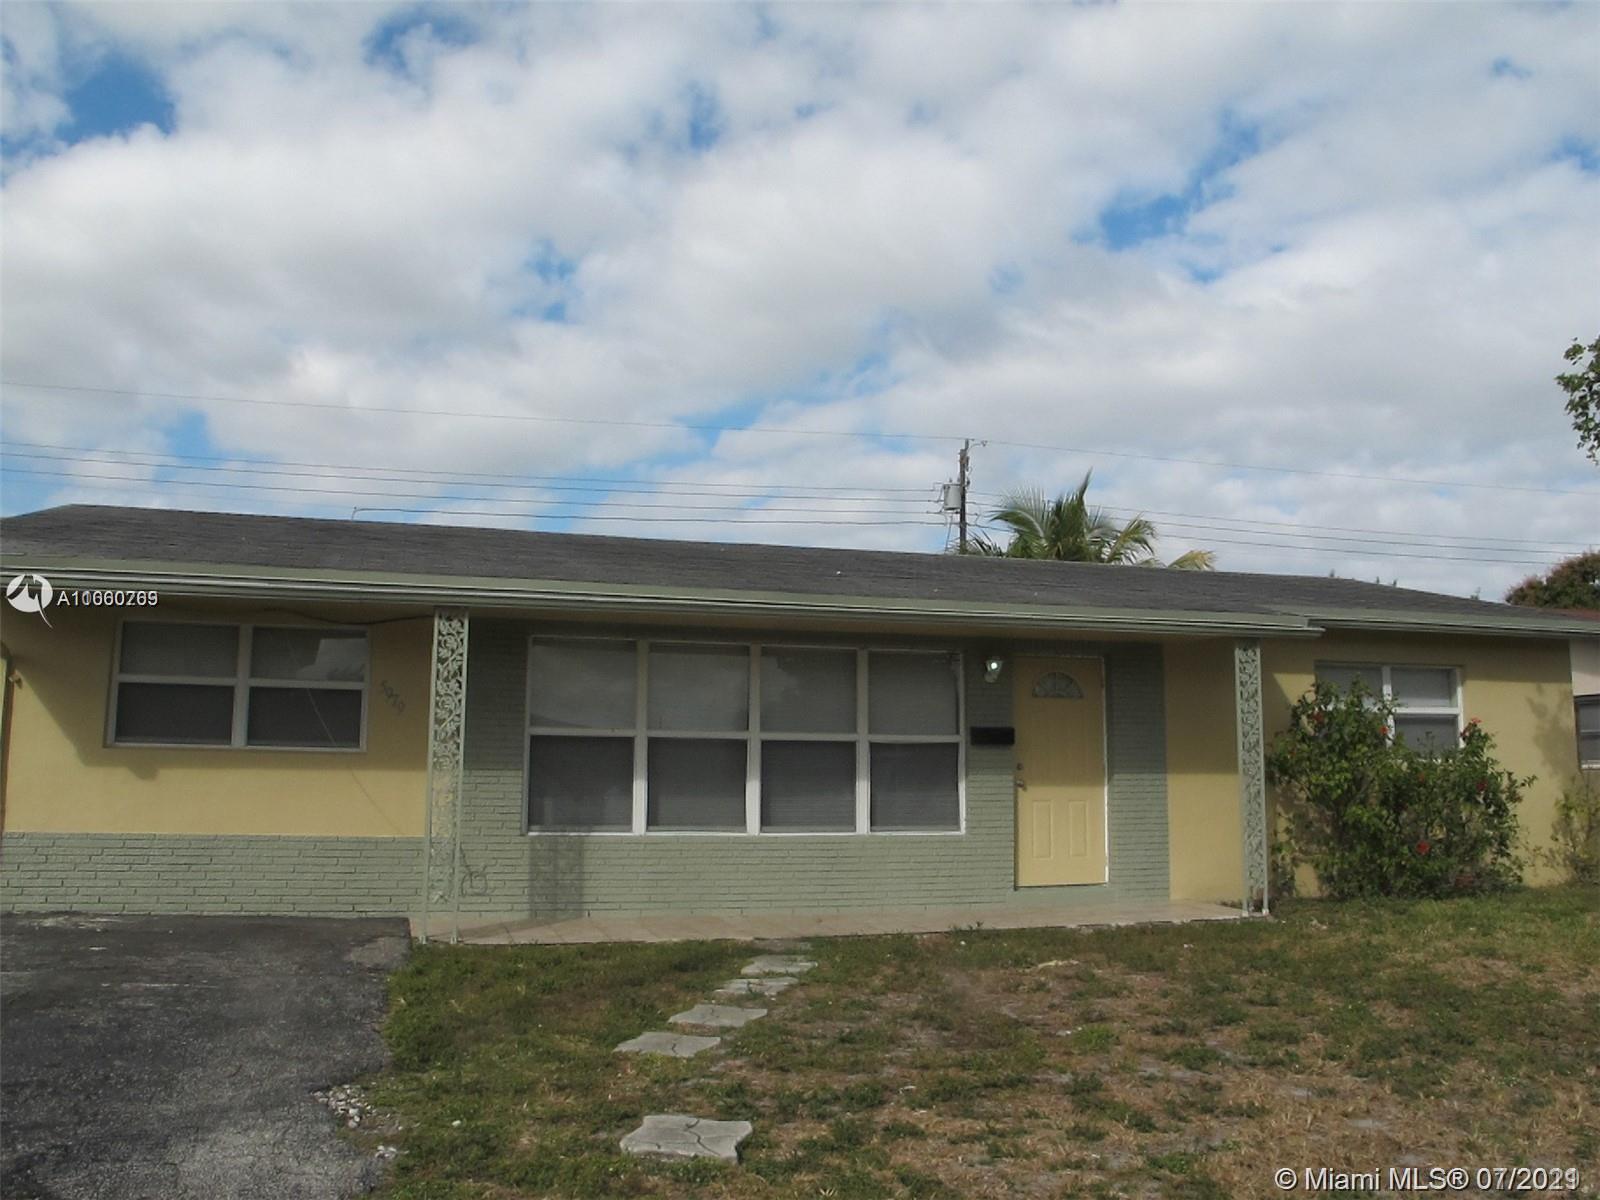 Sunrise Golf Village - 5979 NW 15th St, Sunrise, FL 33313